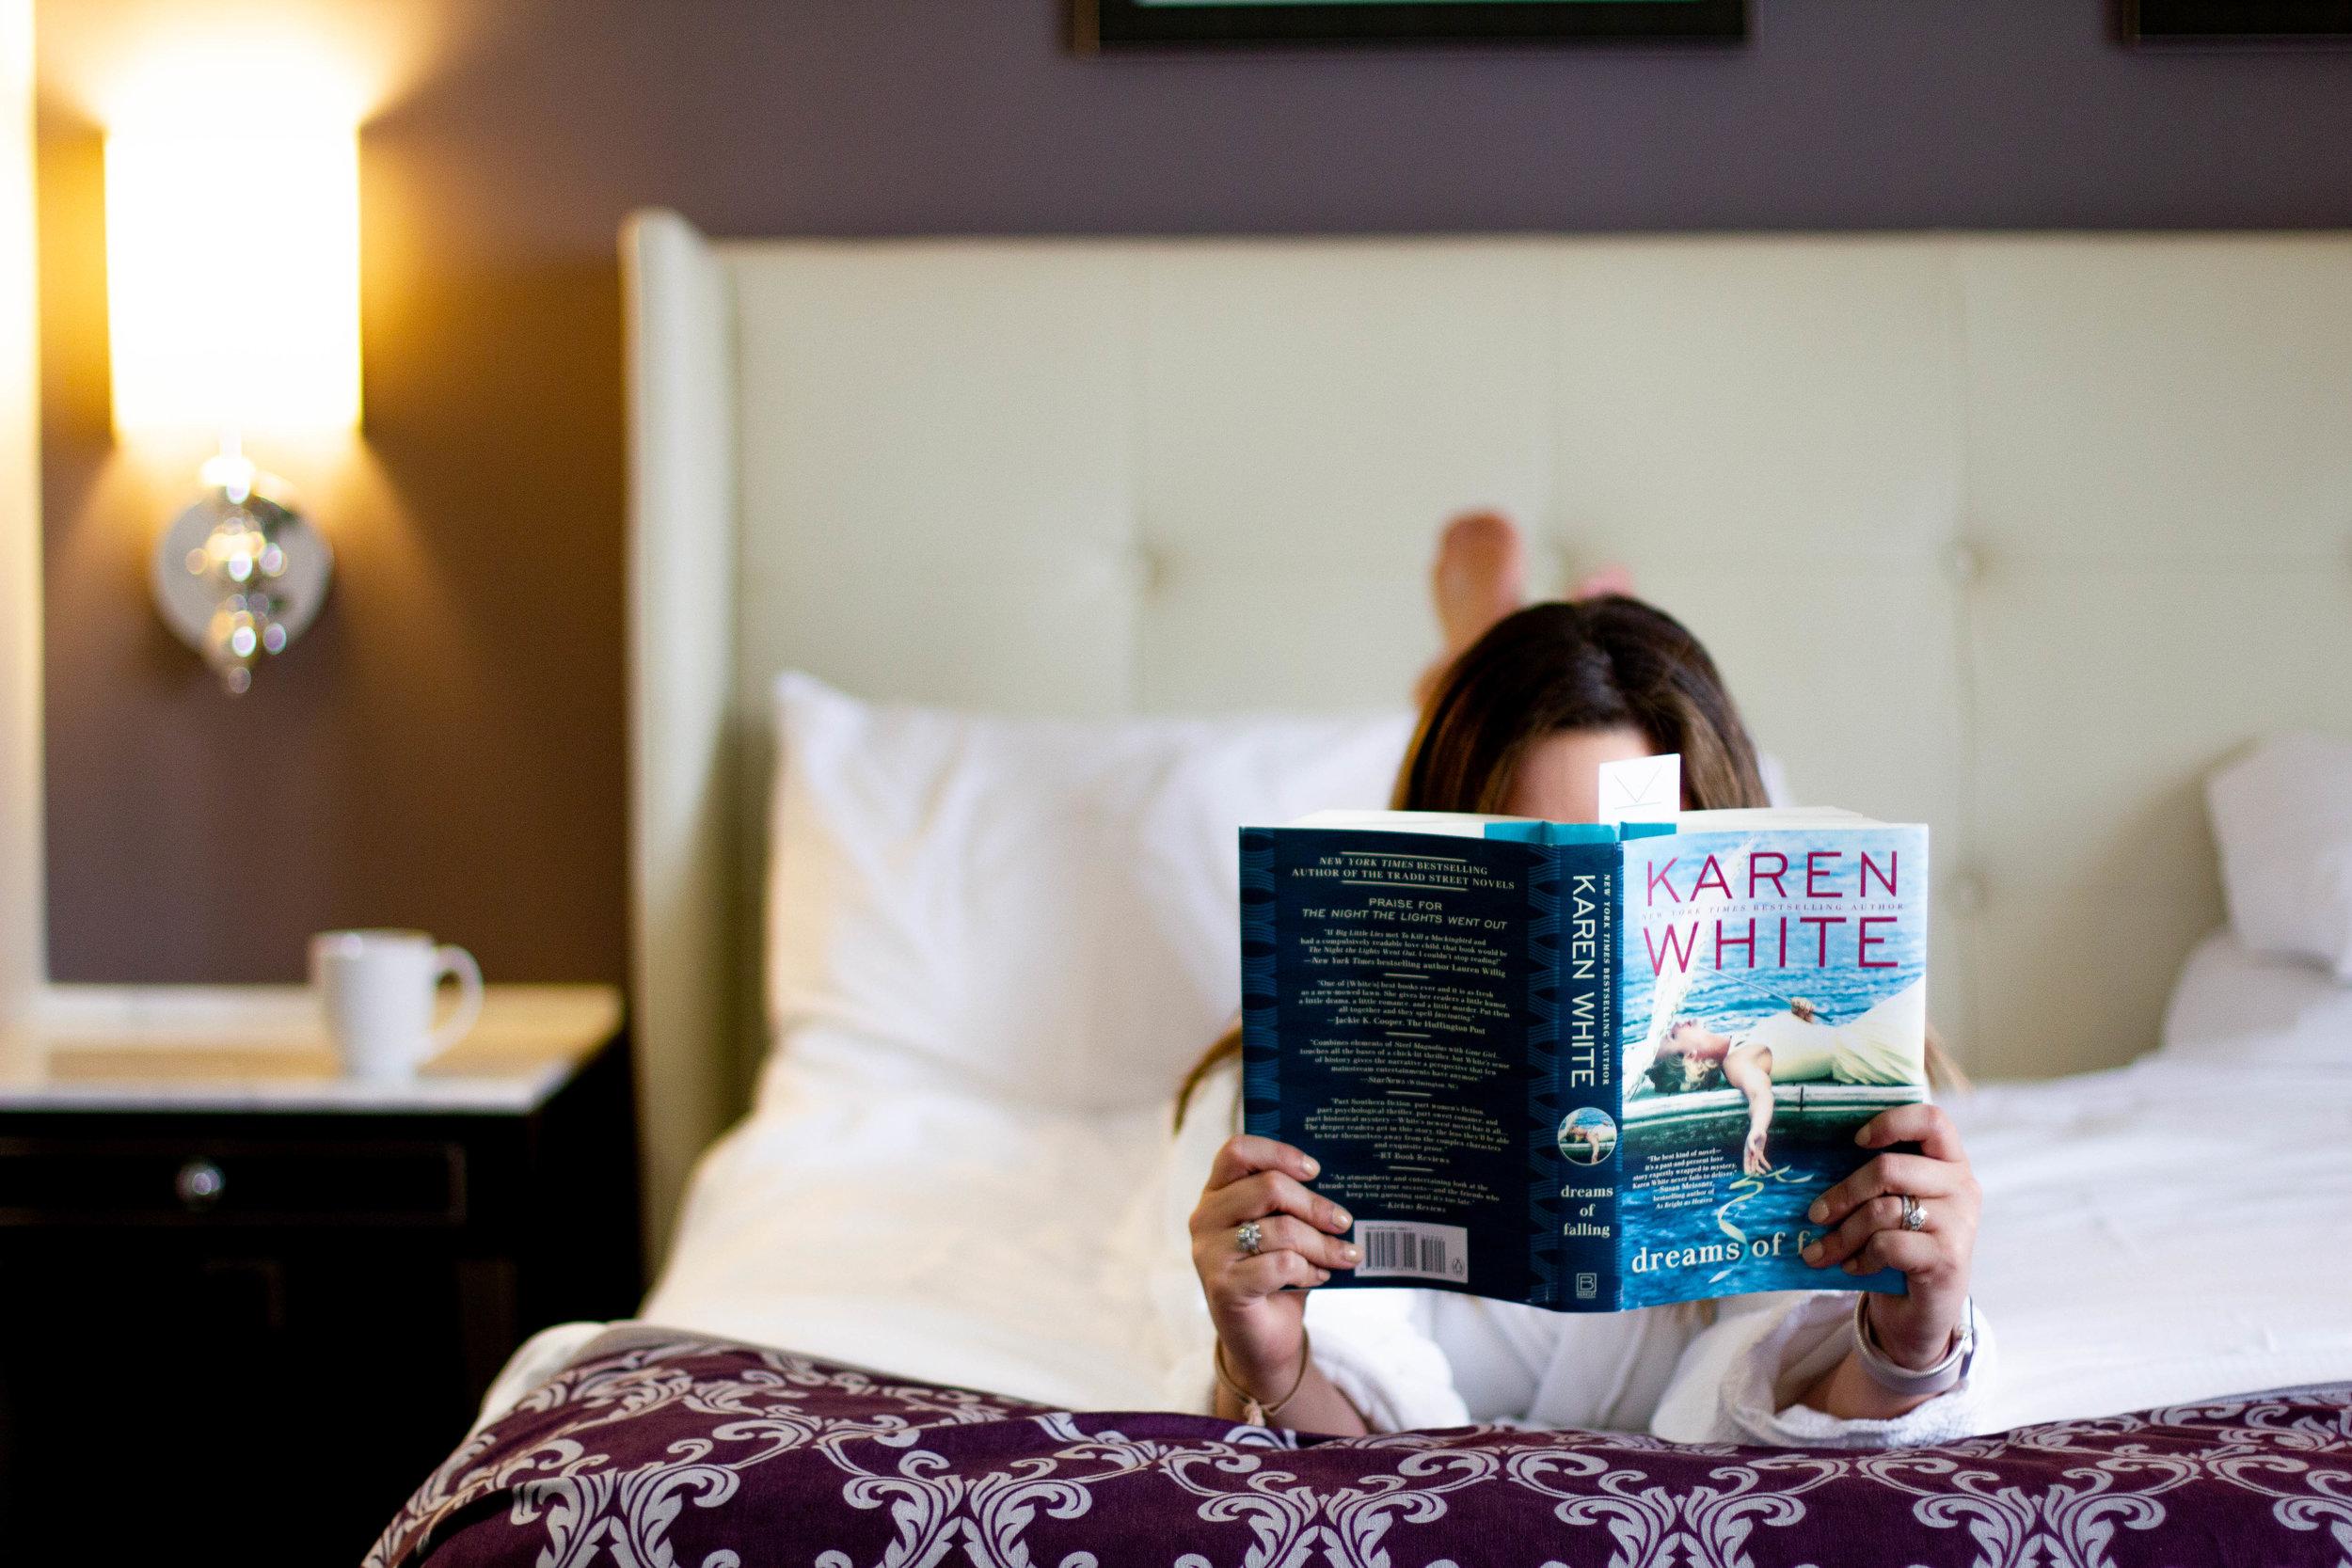 Reading Dreams of Falling by Karen White at the Ambassador Hotel in Kansas City, MO